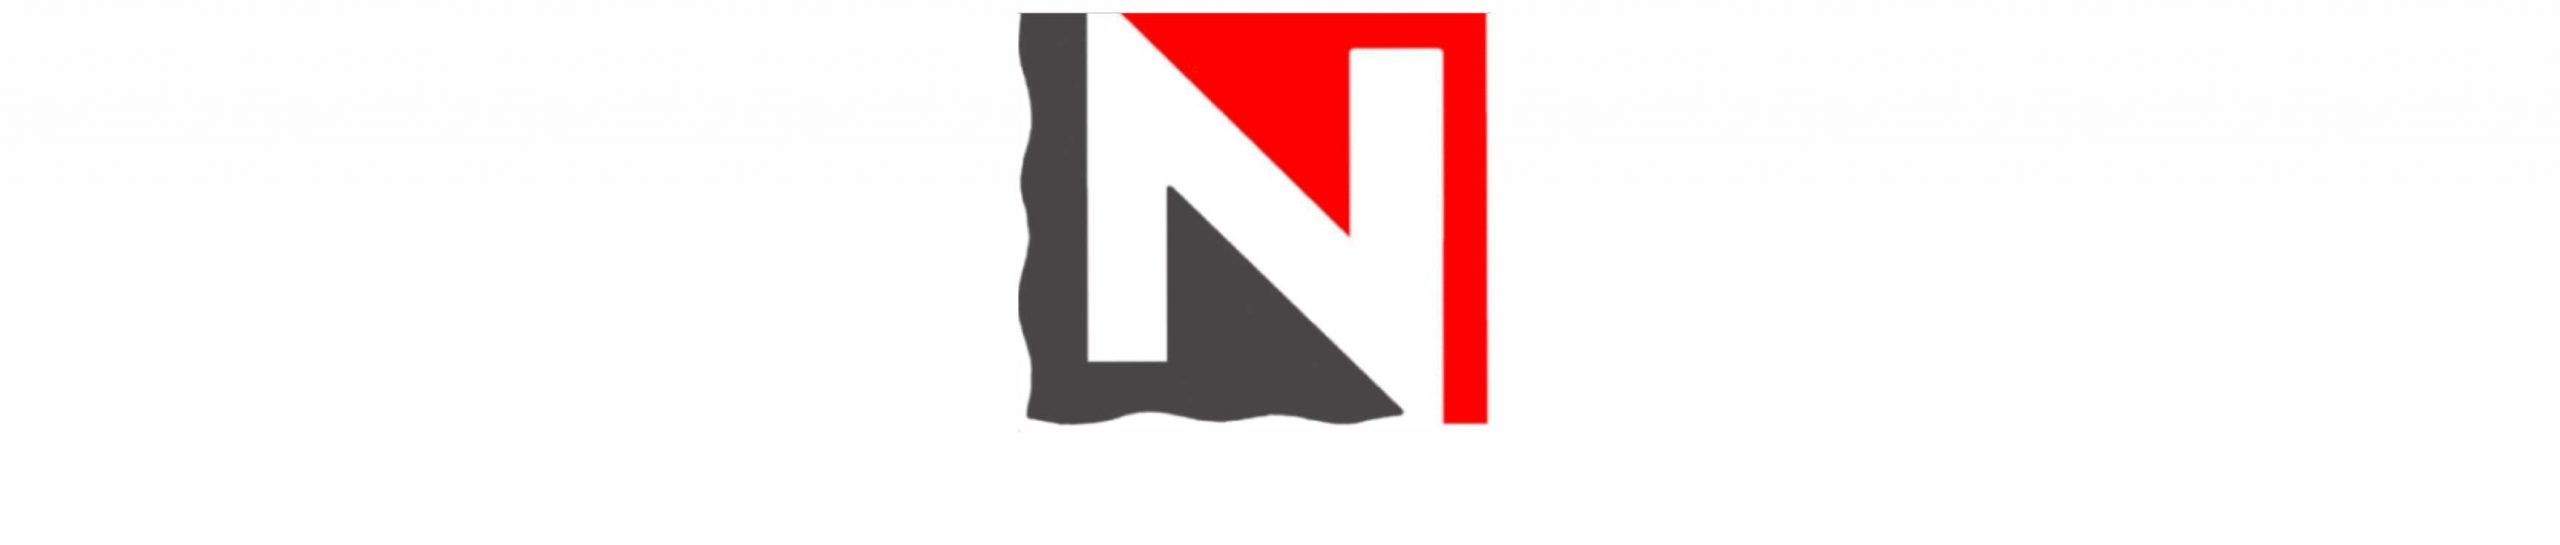 NENN Baustoffe GmbH - Berlin